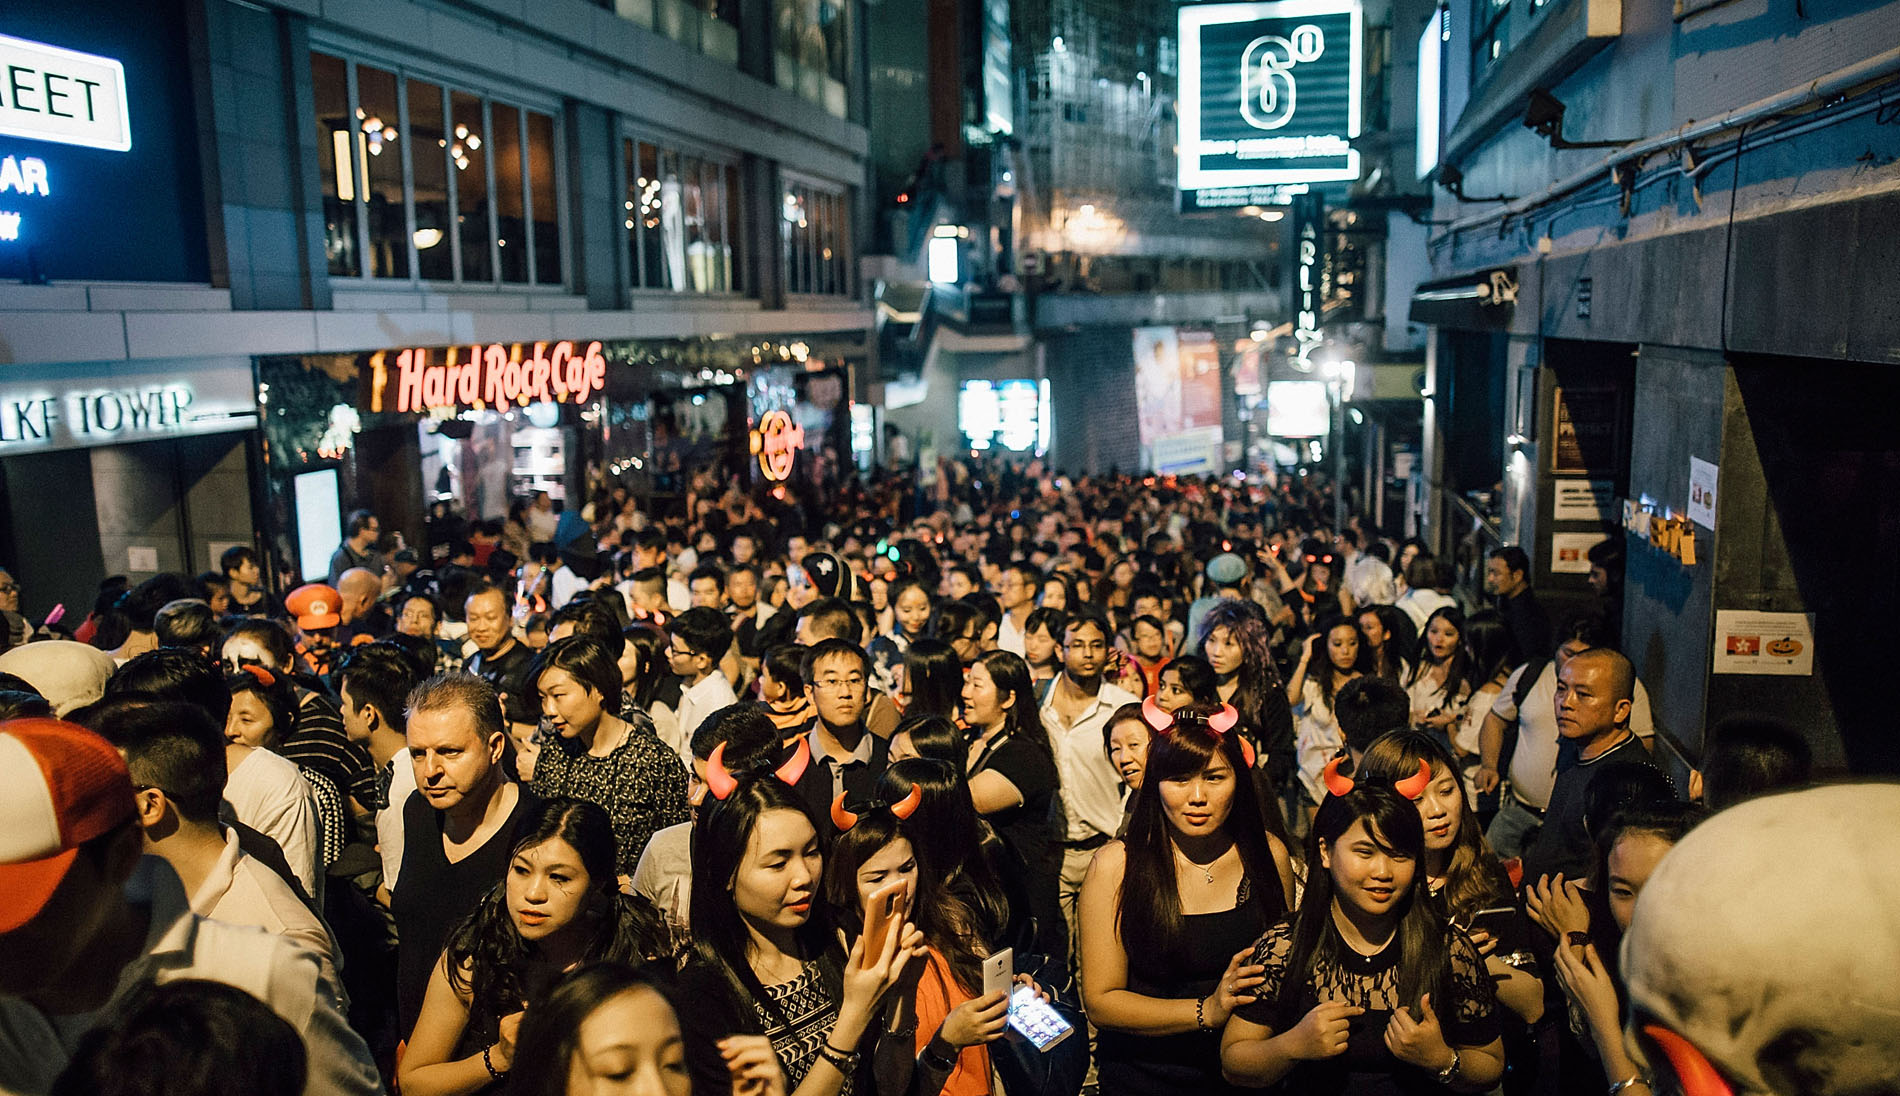 lan kwai fong: hong kong's party district   cnn travel